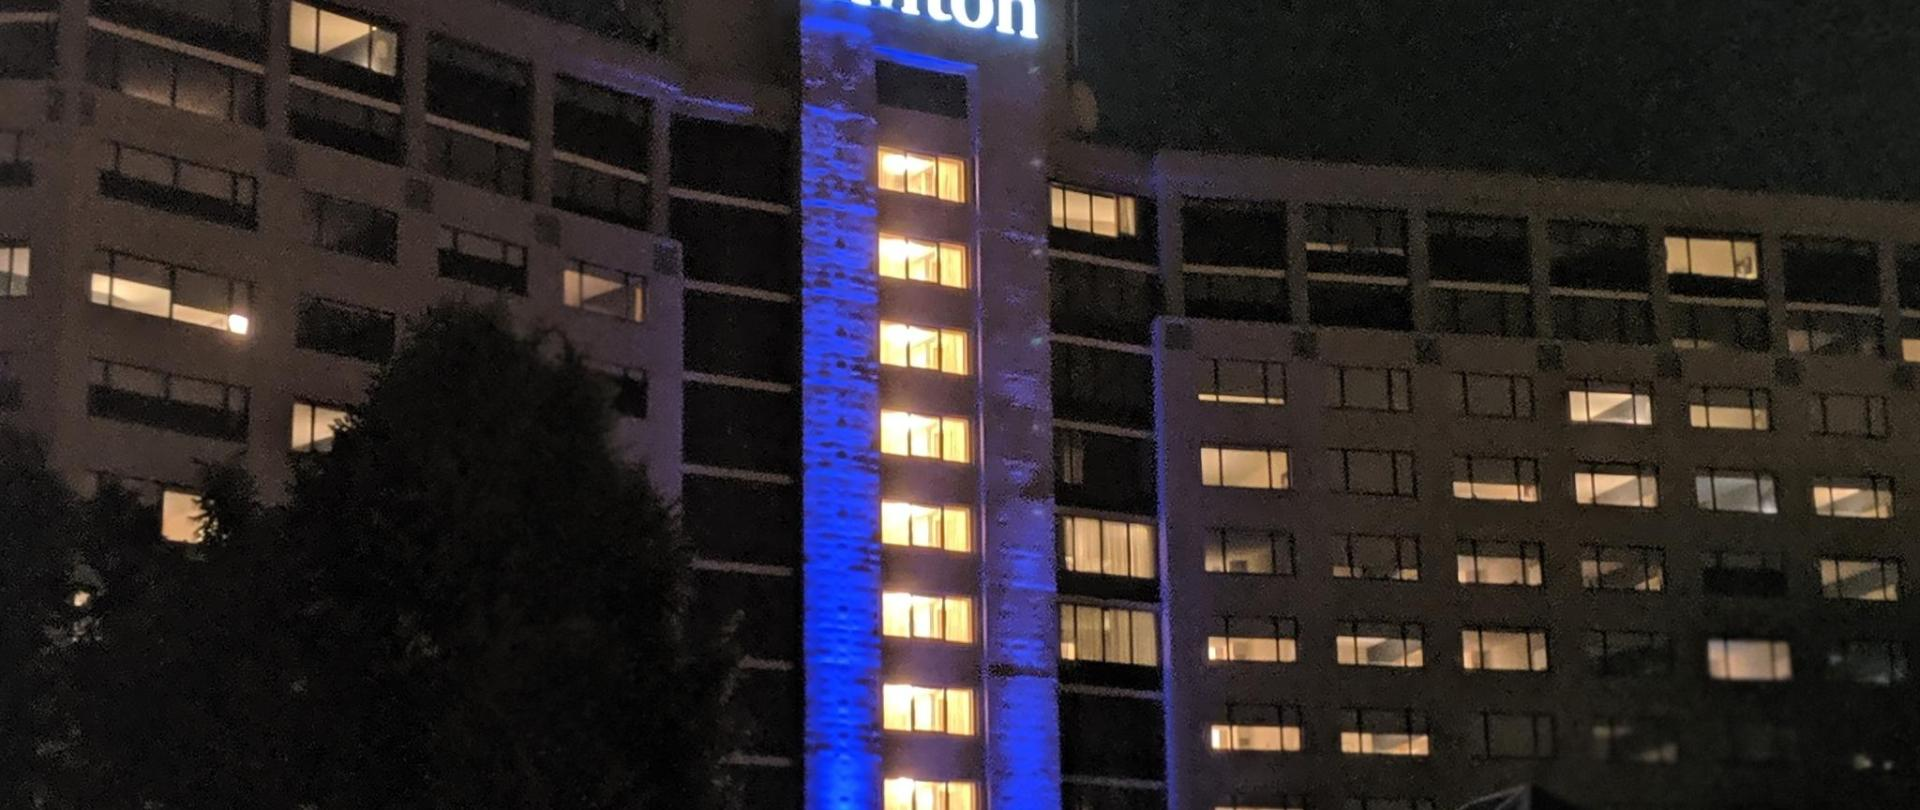 Blue lights image 2.jpg